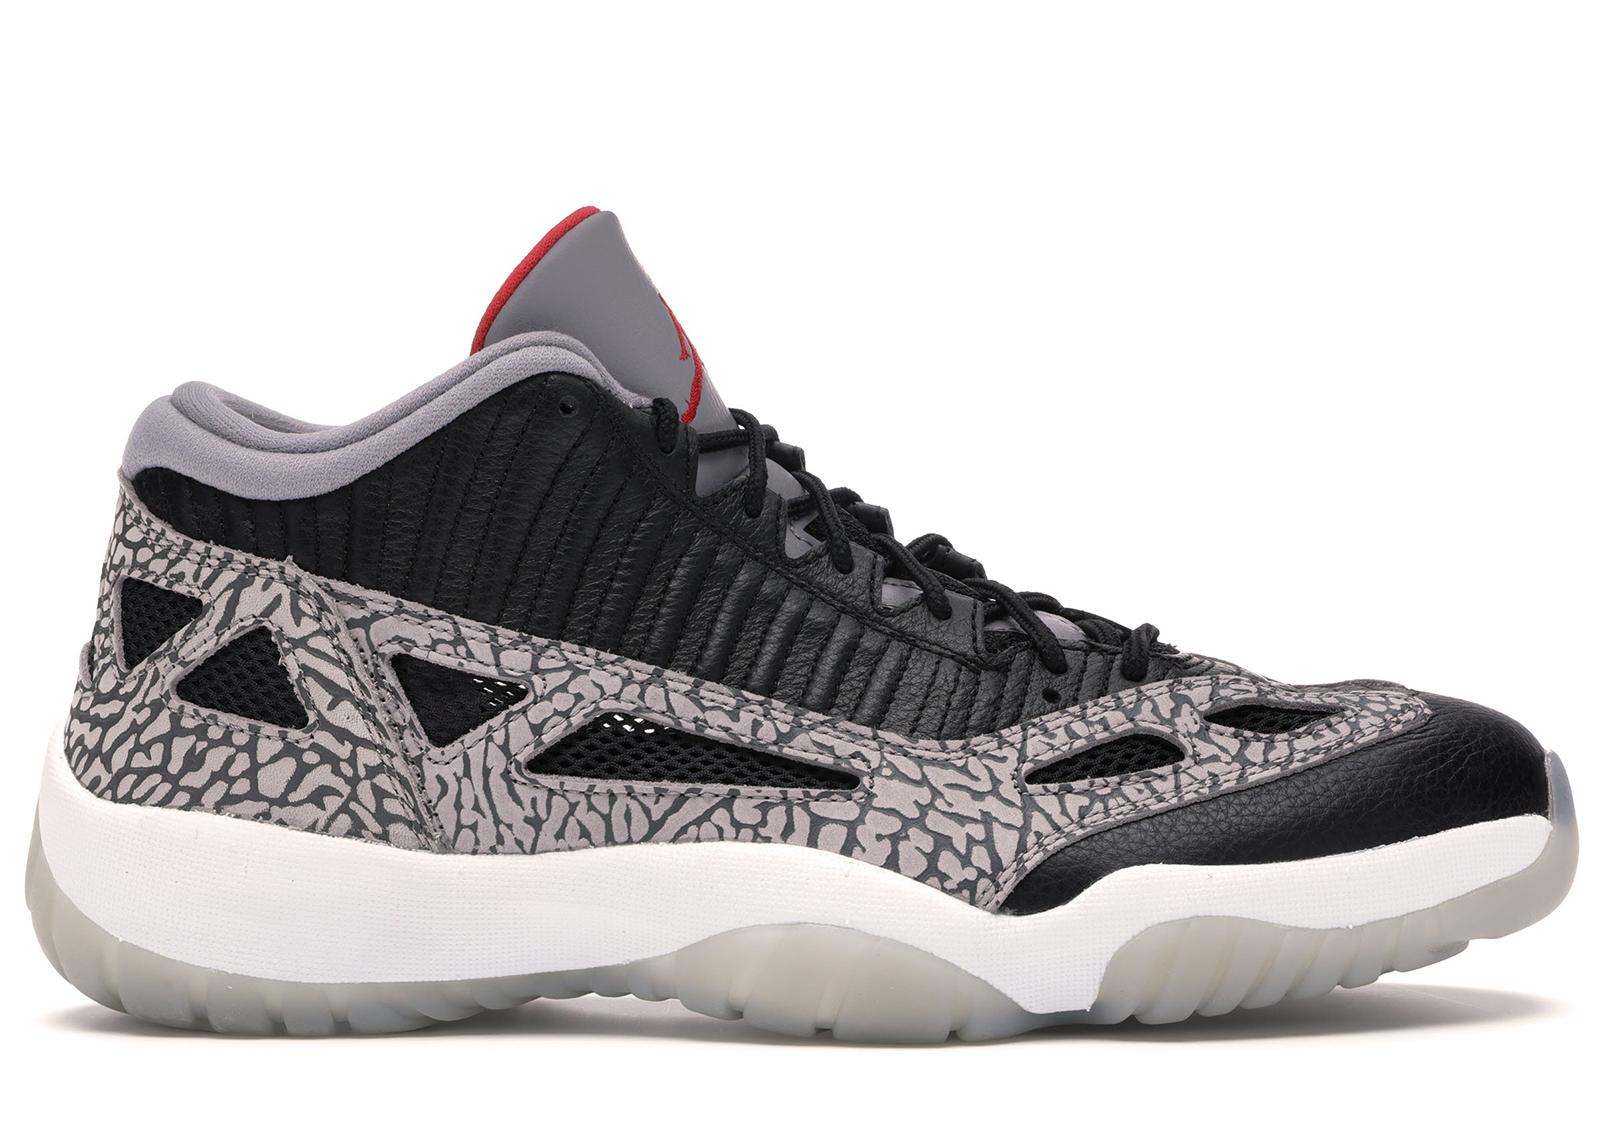 Buy Air Jordan 11 Shoes & Deadstock Sneakers